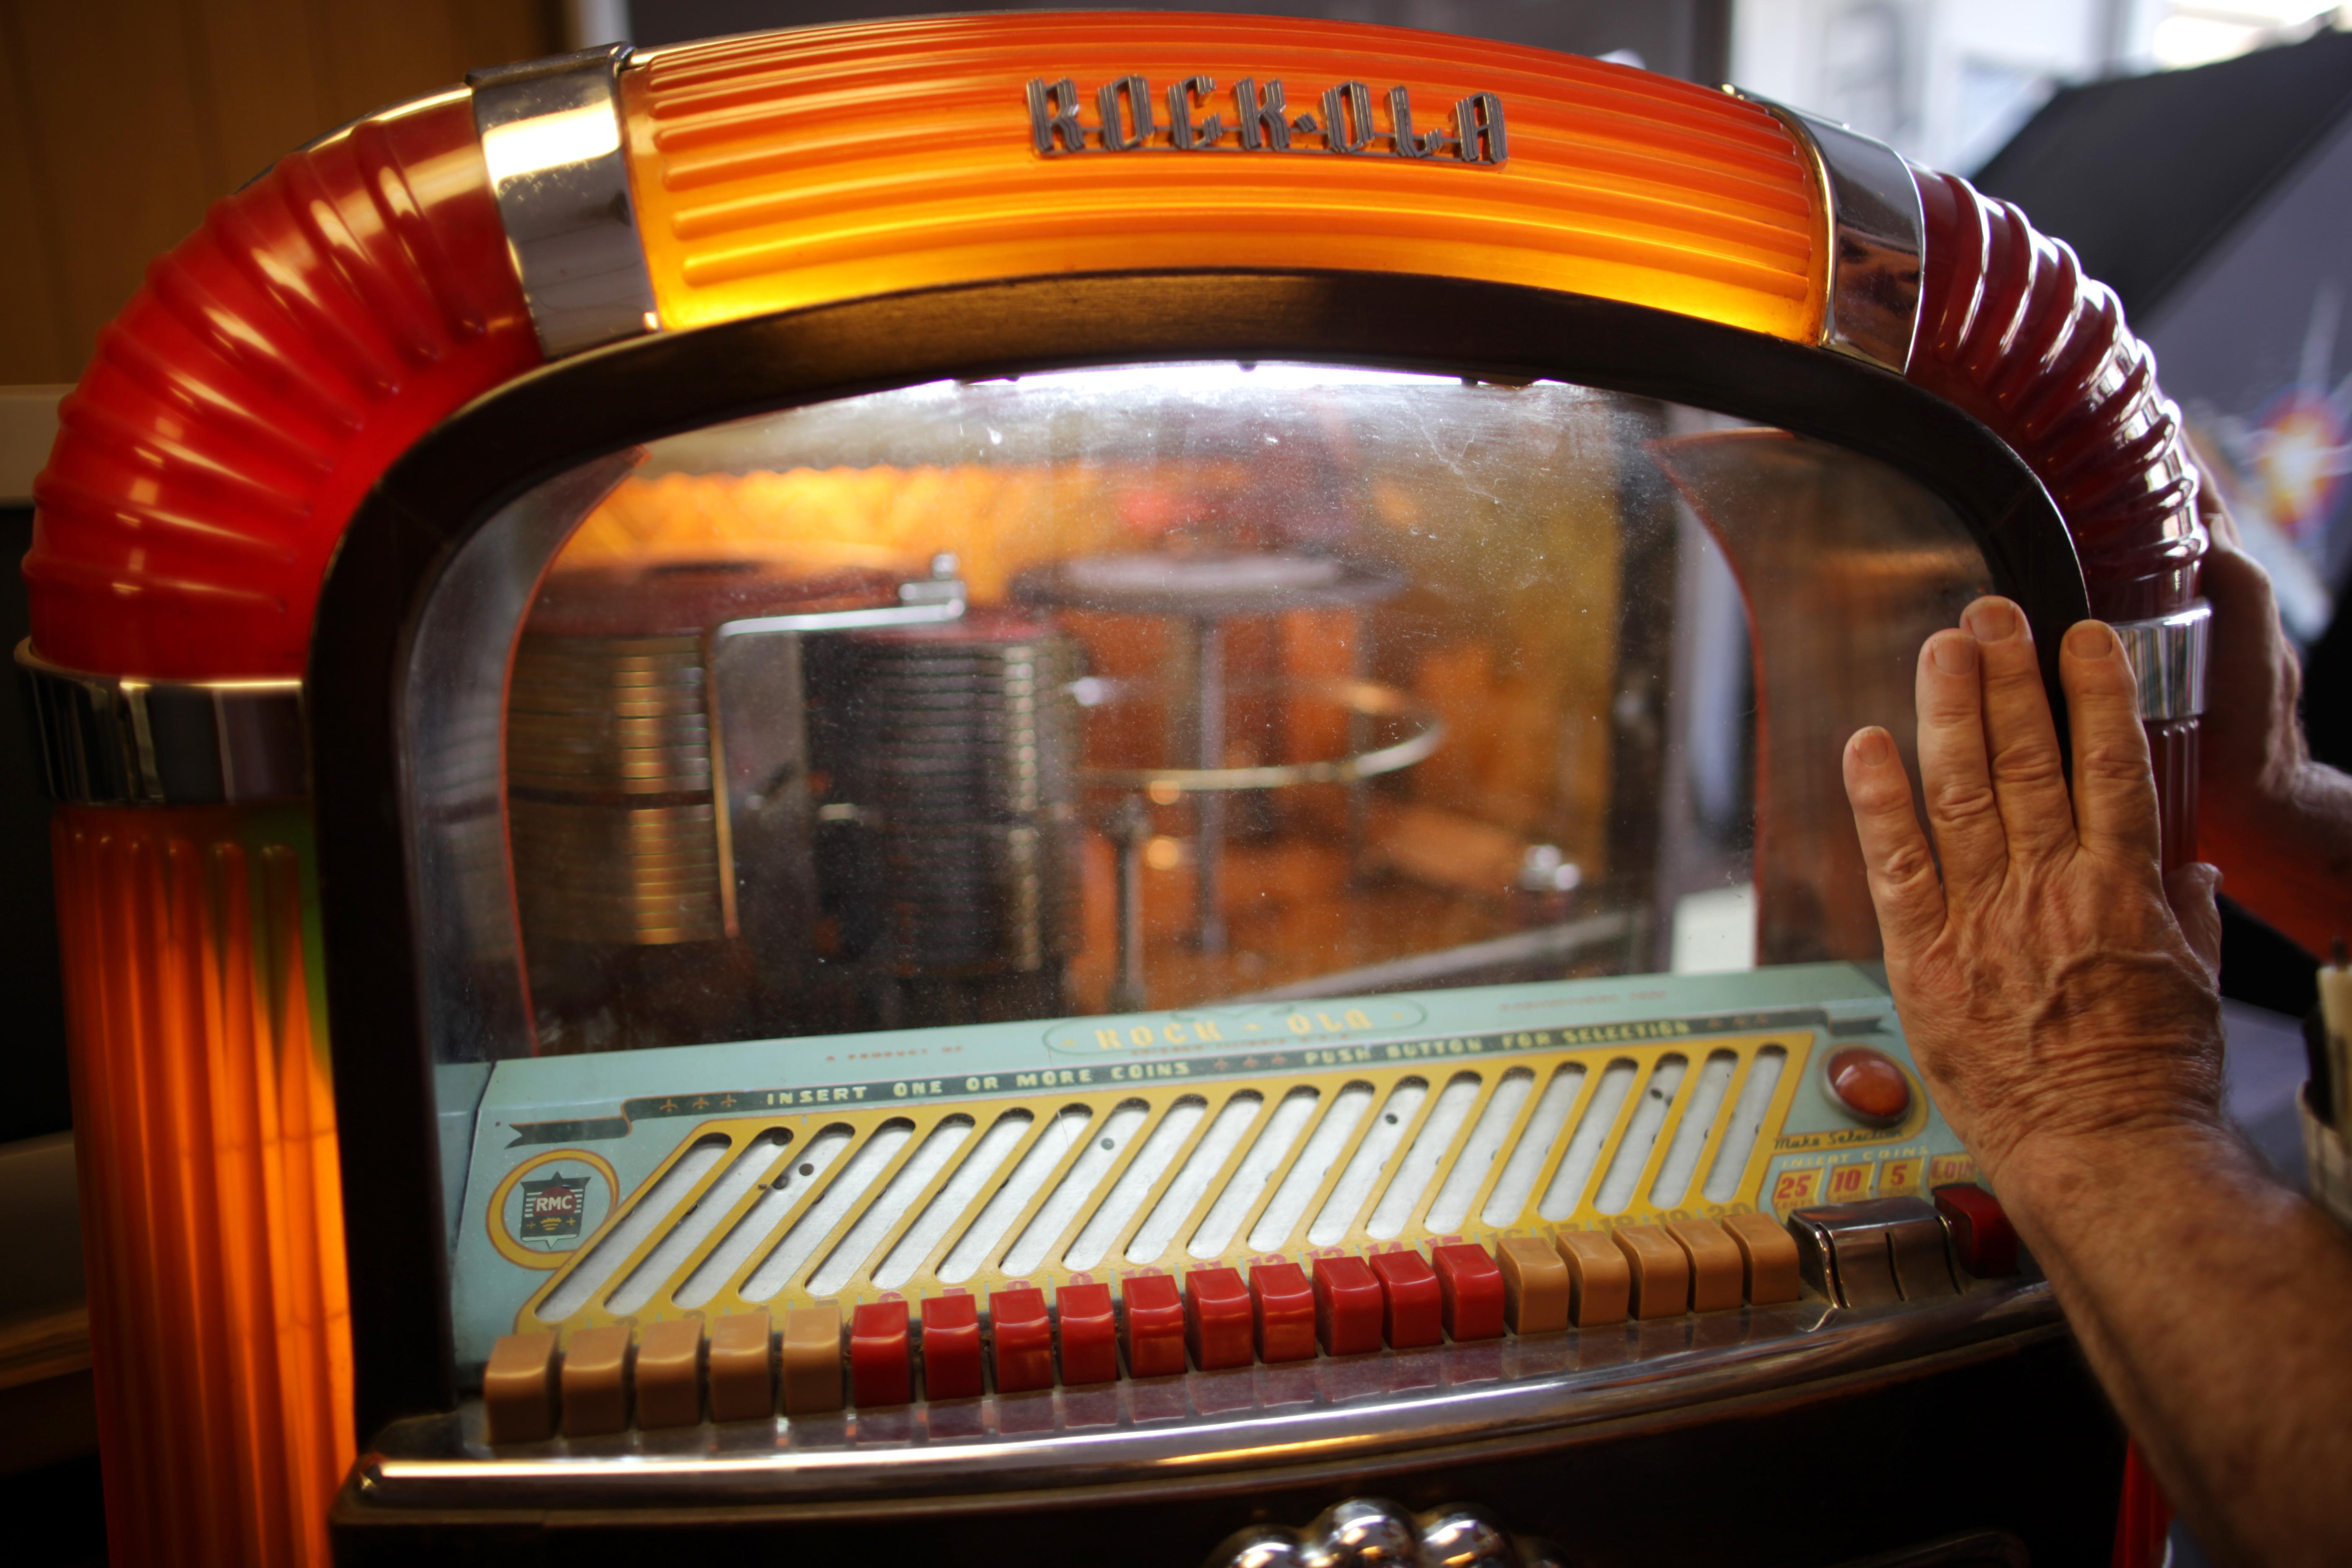 Jukebox shop holds happy memories - The Boston Globe